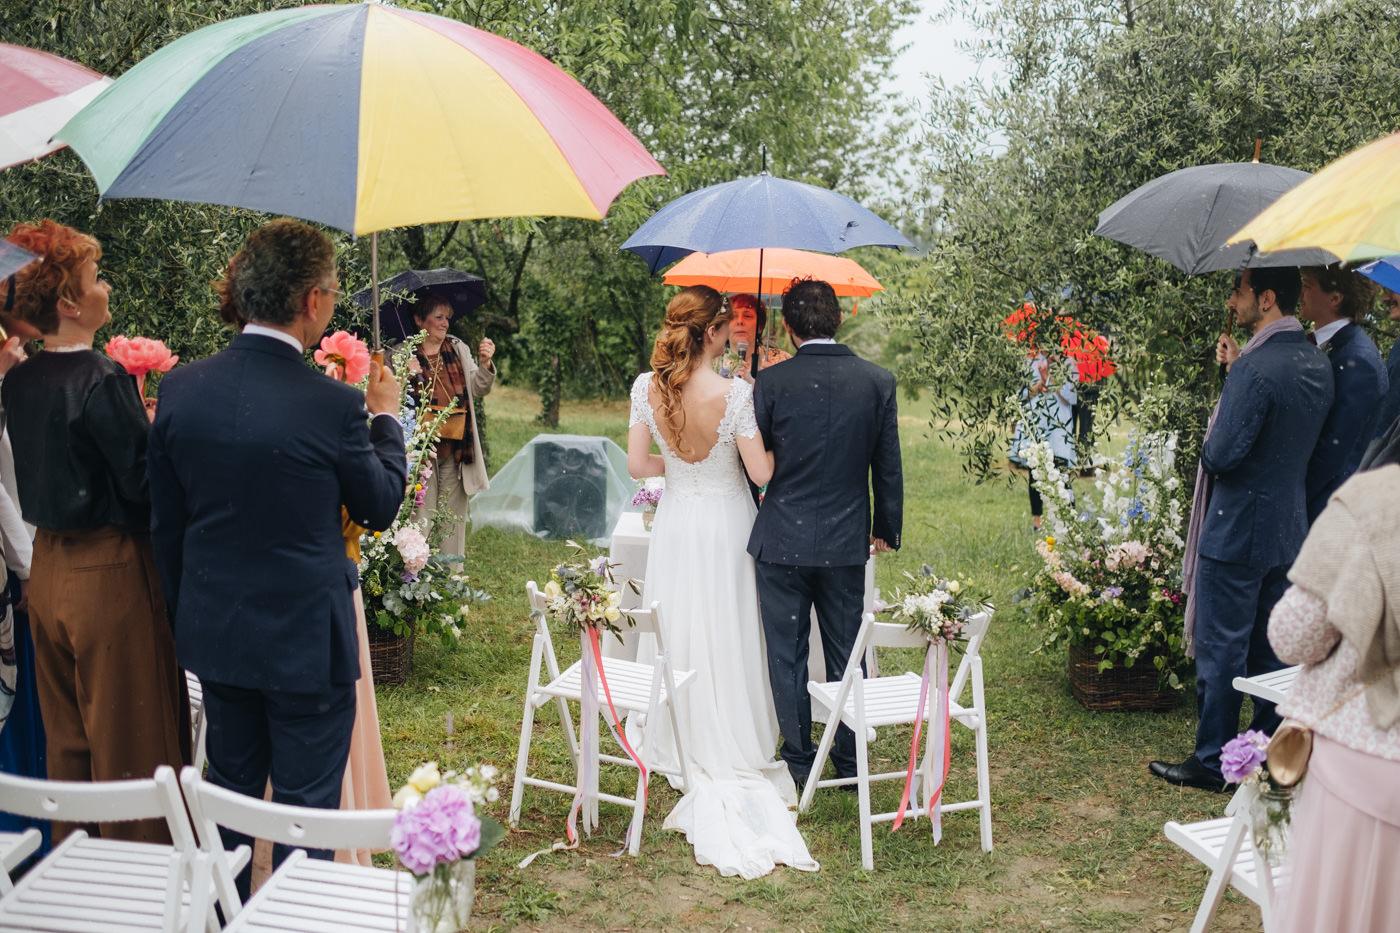 matrimoni_all_italiana_fotografo_matrimonio_toscana-27.jpg